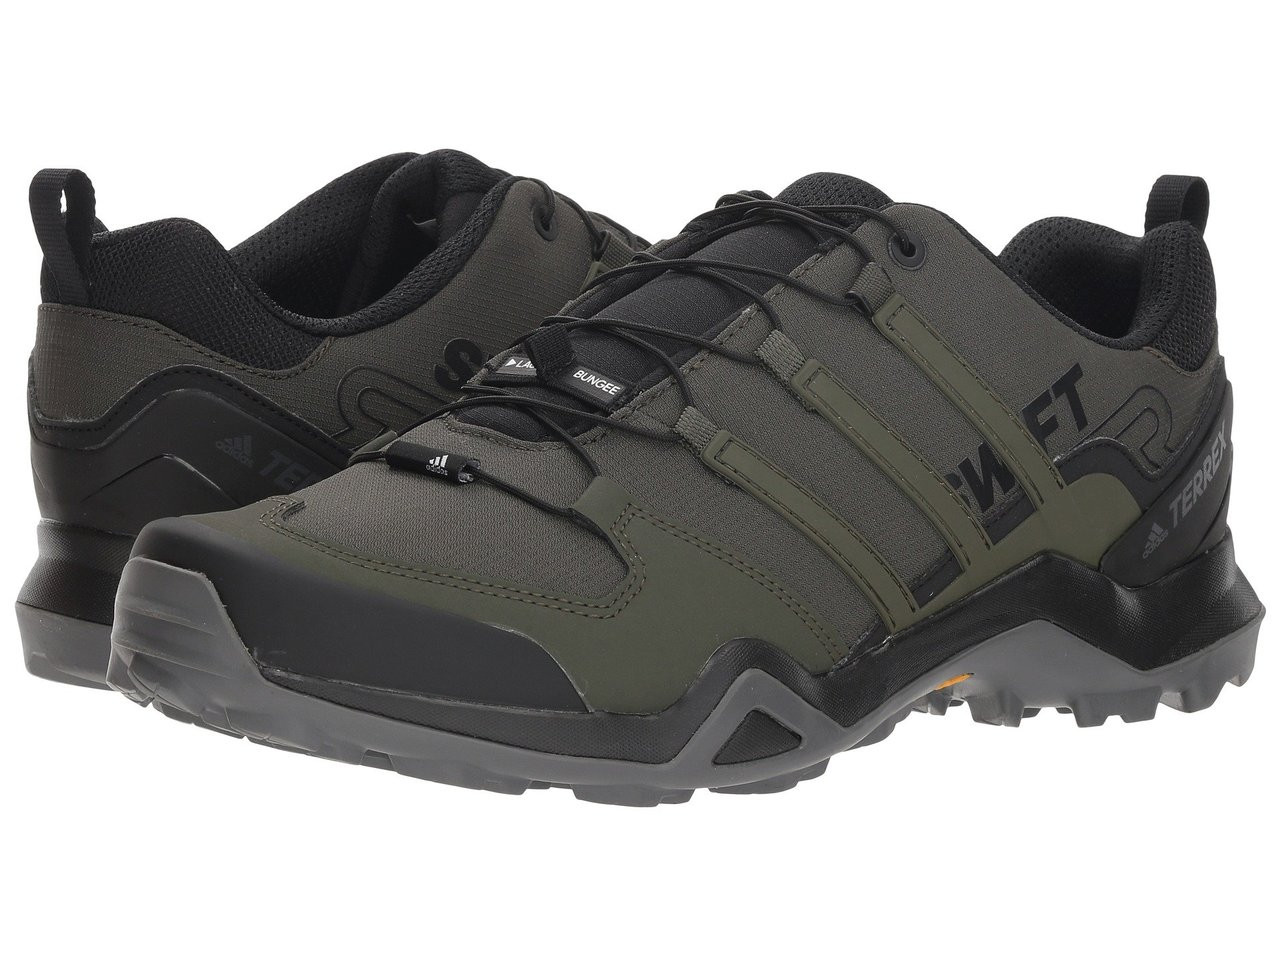 Adidas AC7983 Men's Terrex Swift R2